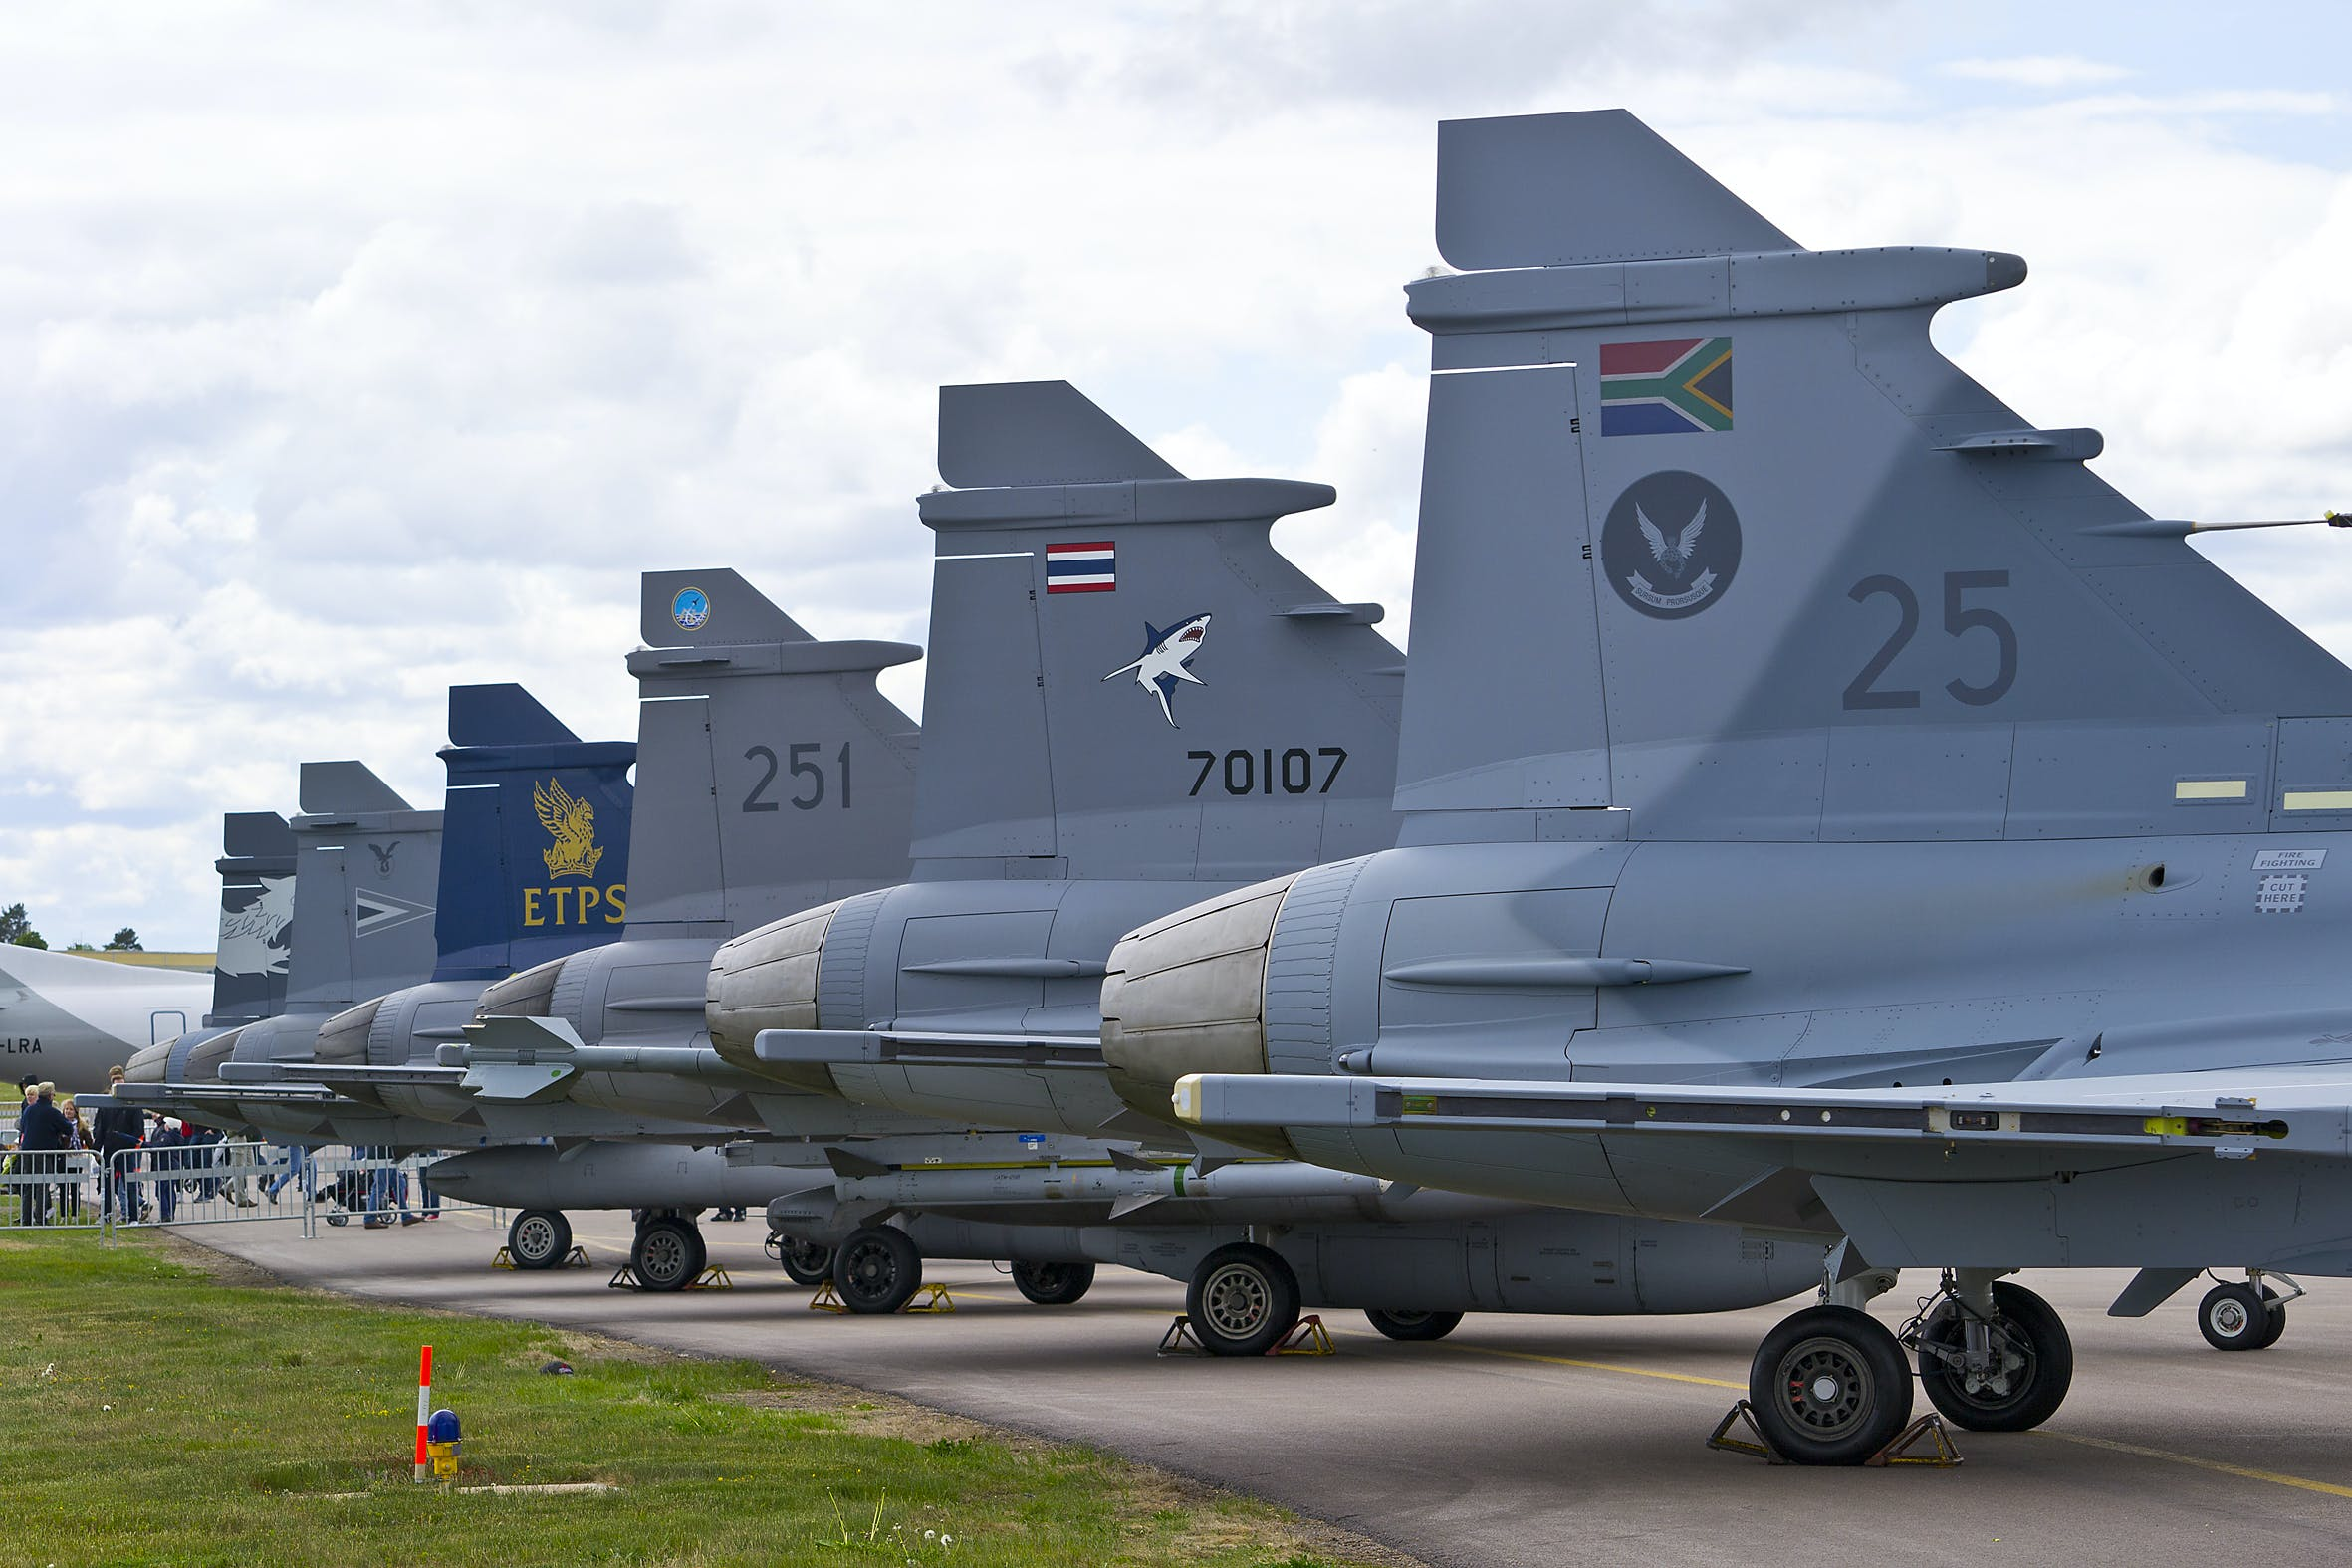 Free stock photo of aircraft, fighter jet, JAS 39, JAS 39 Gripen